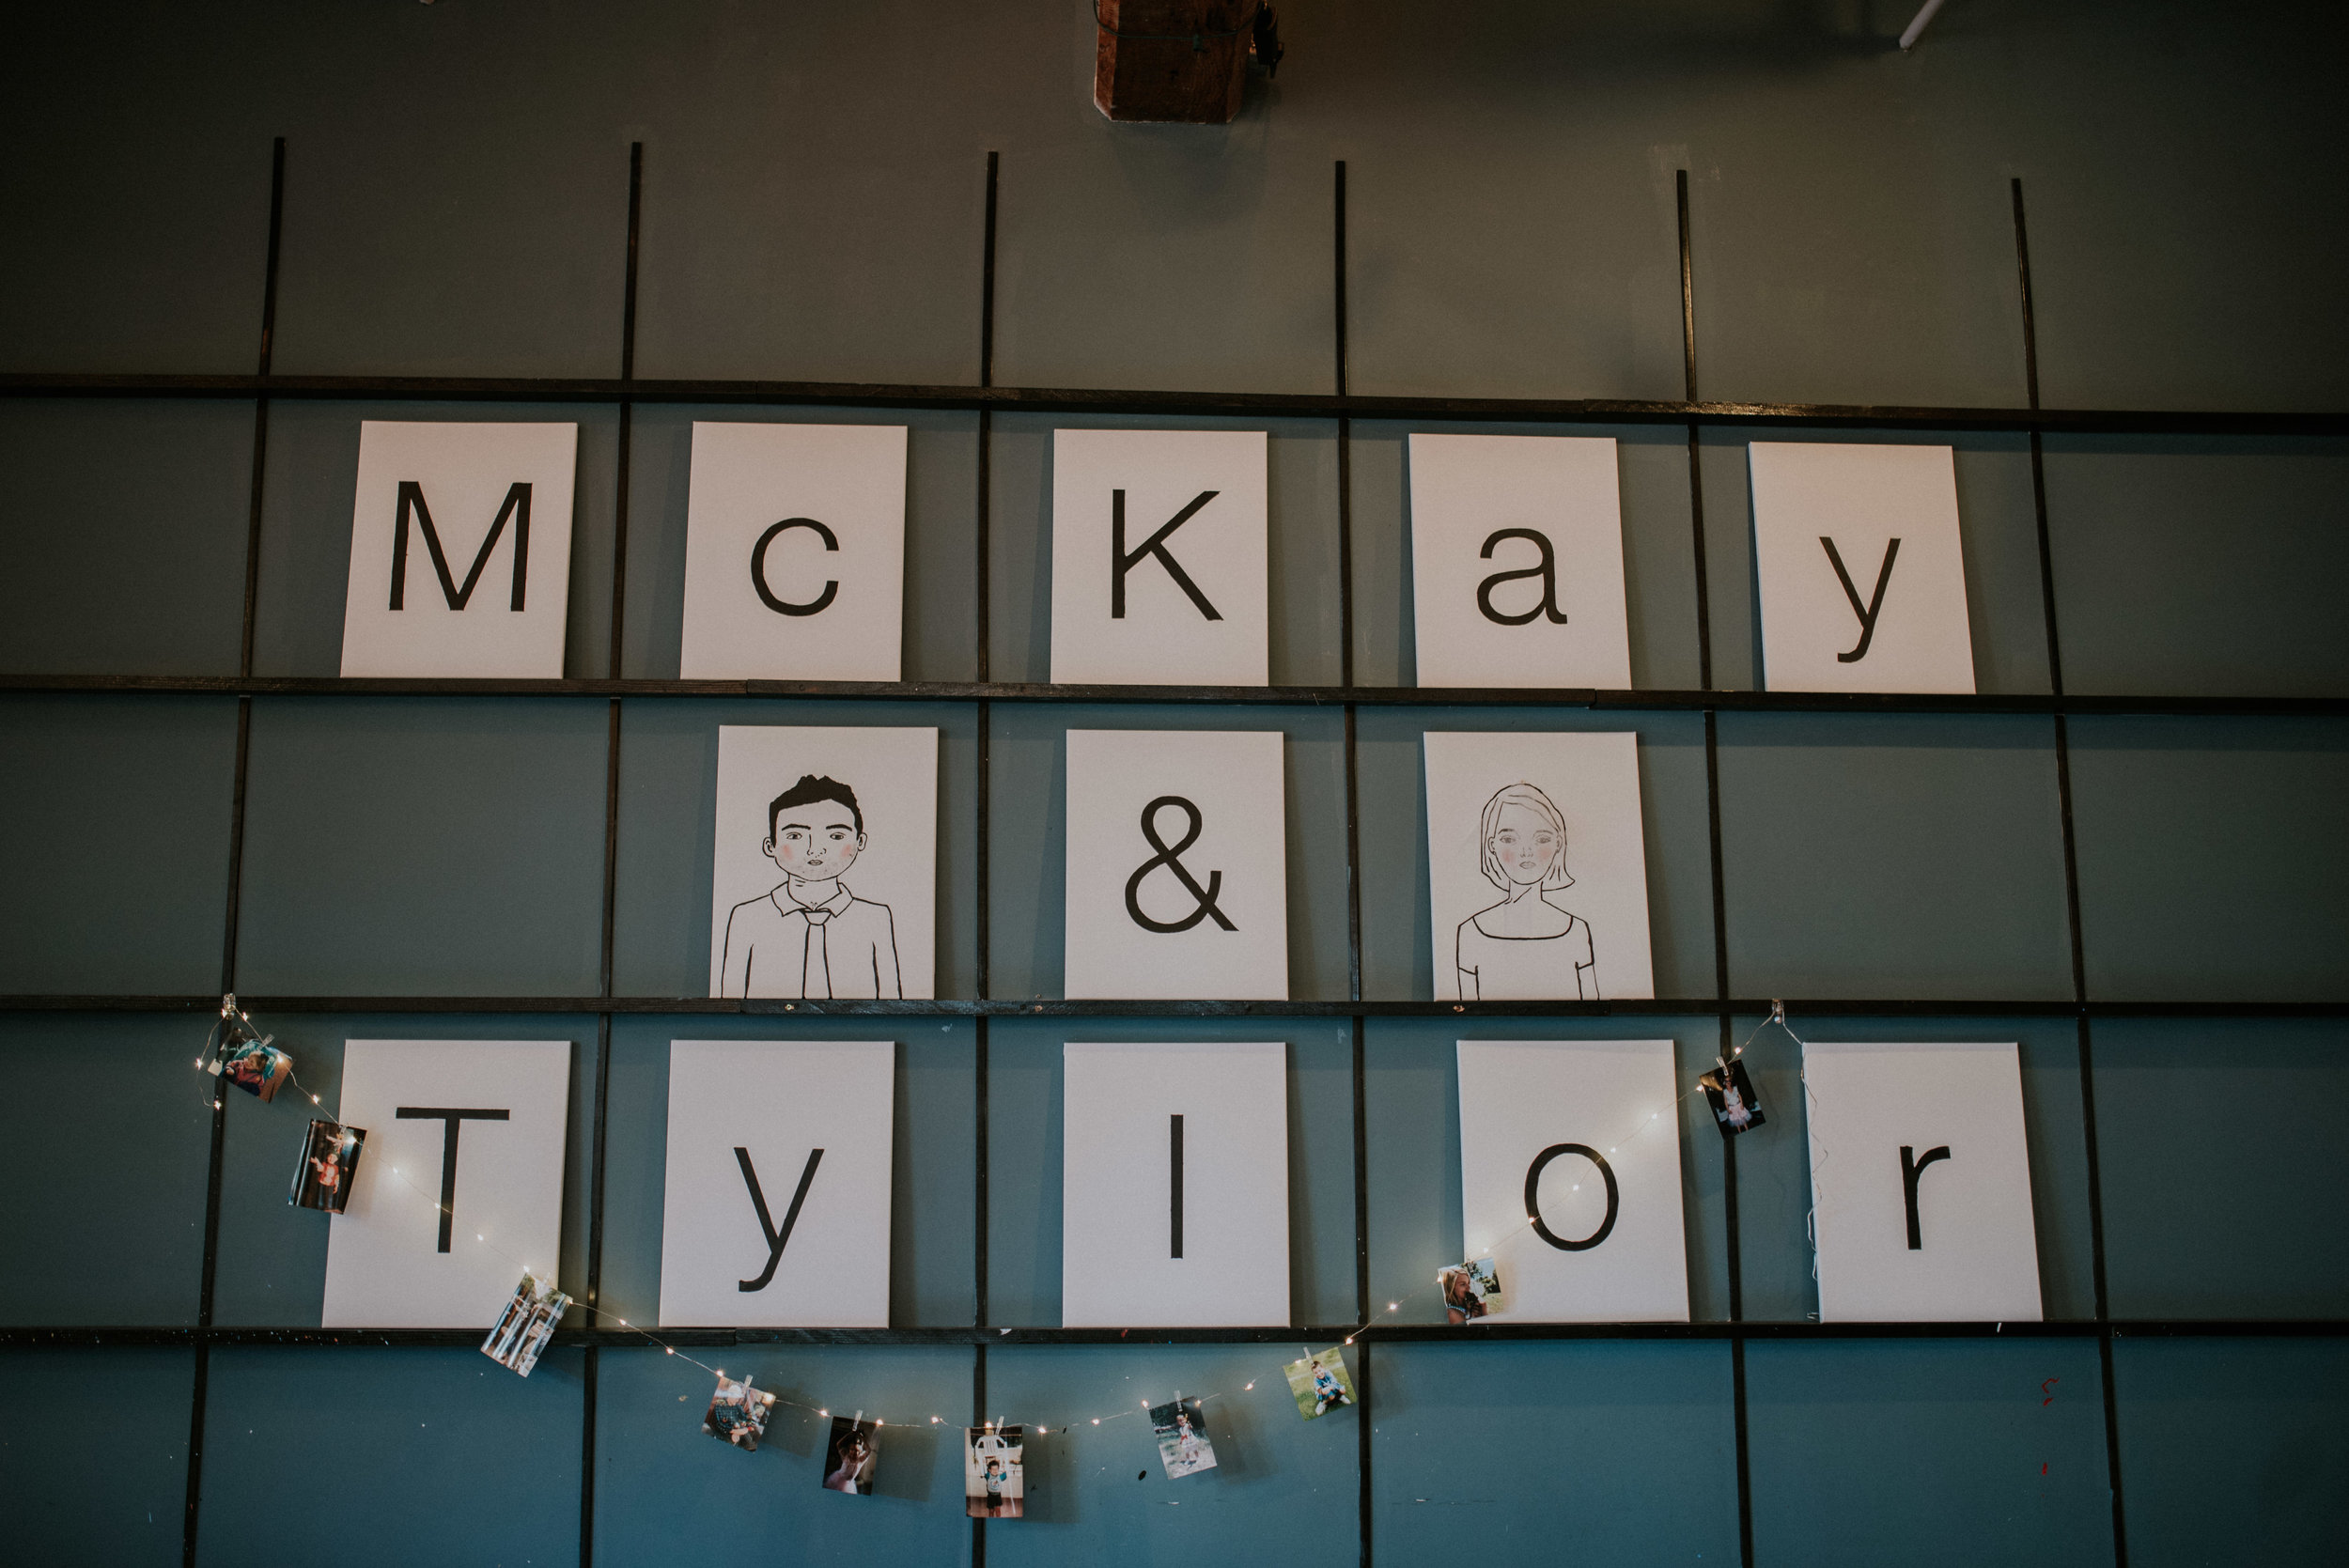 tylor+mckay-367.jpg